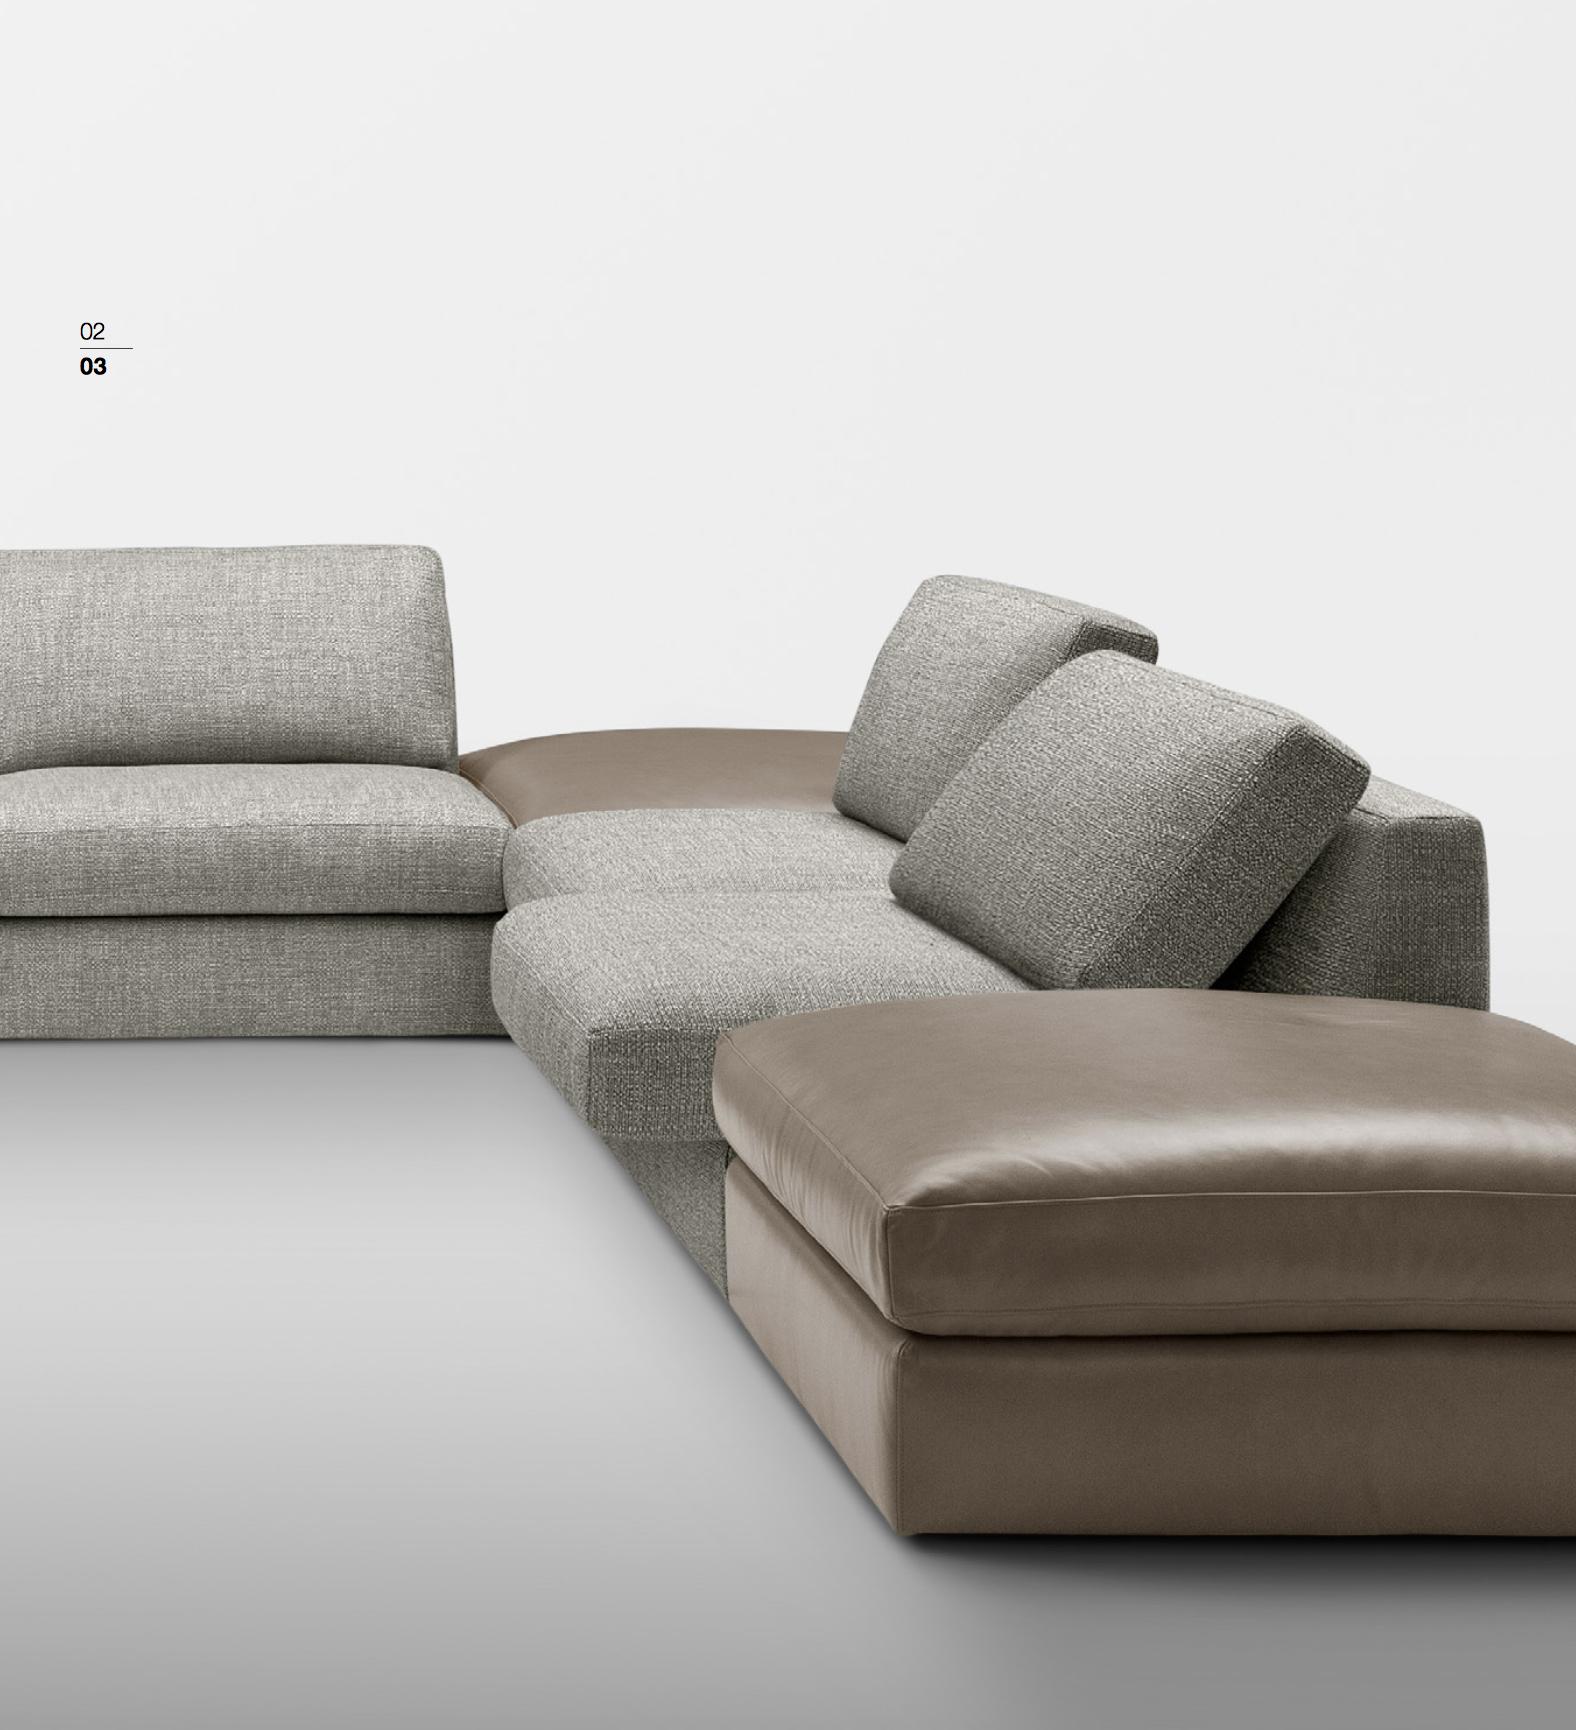 SCT 301 Italian Sectional Sofas